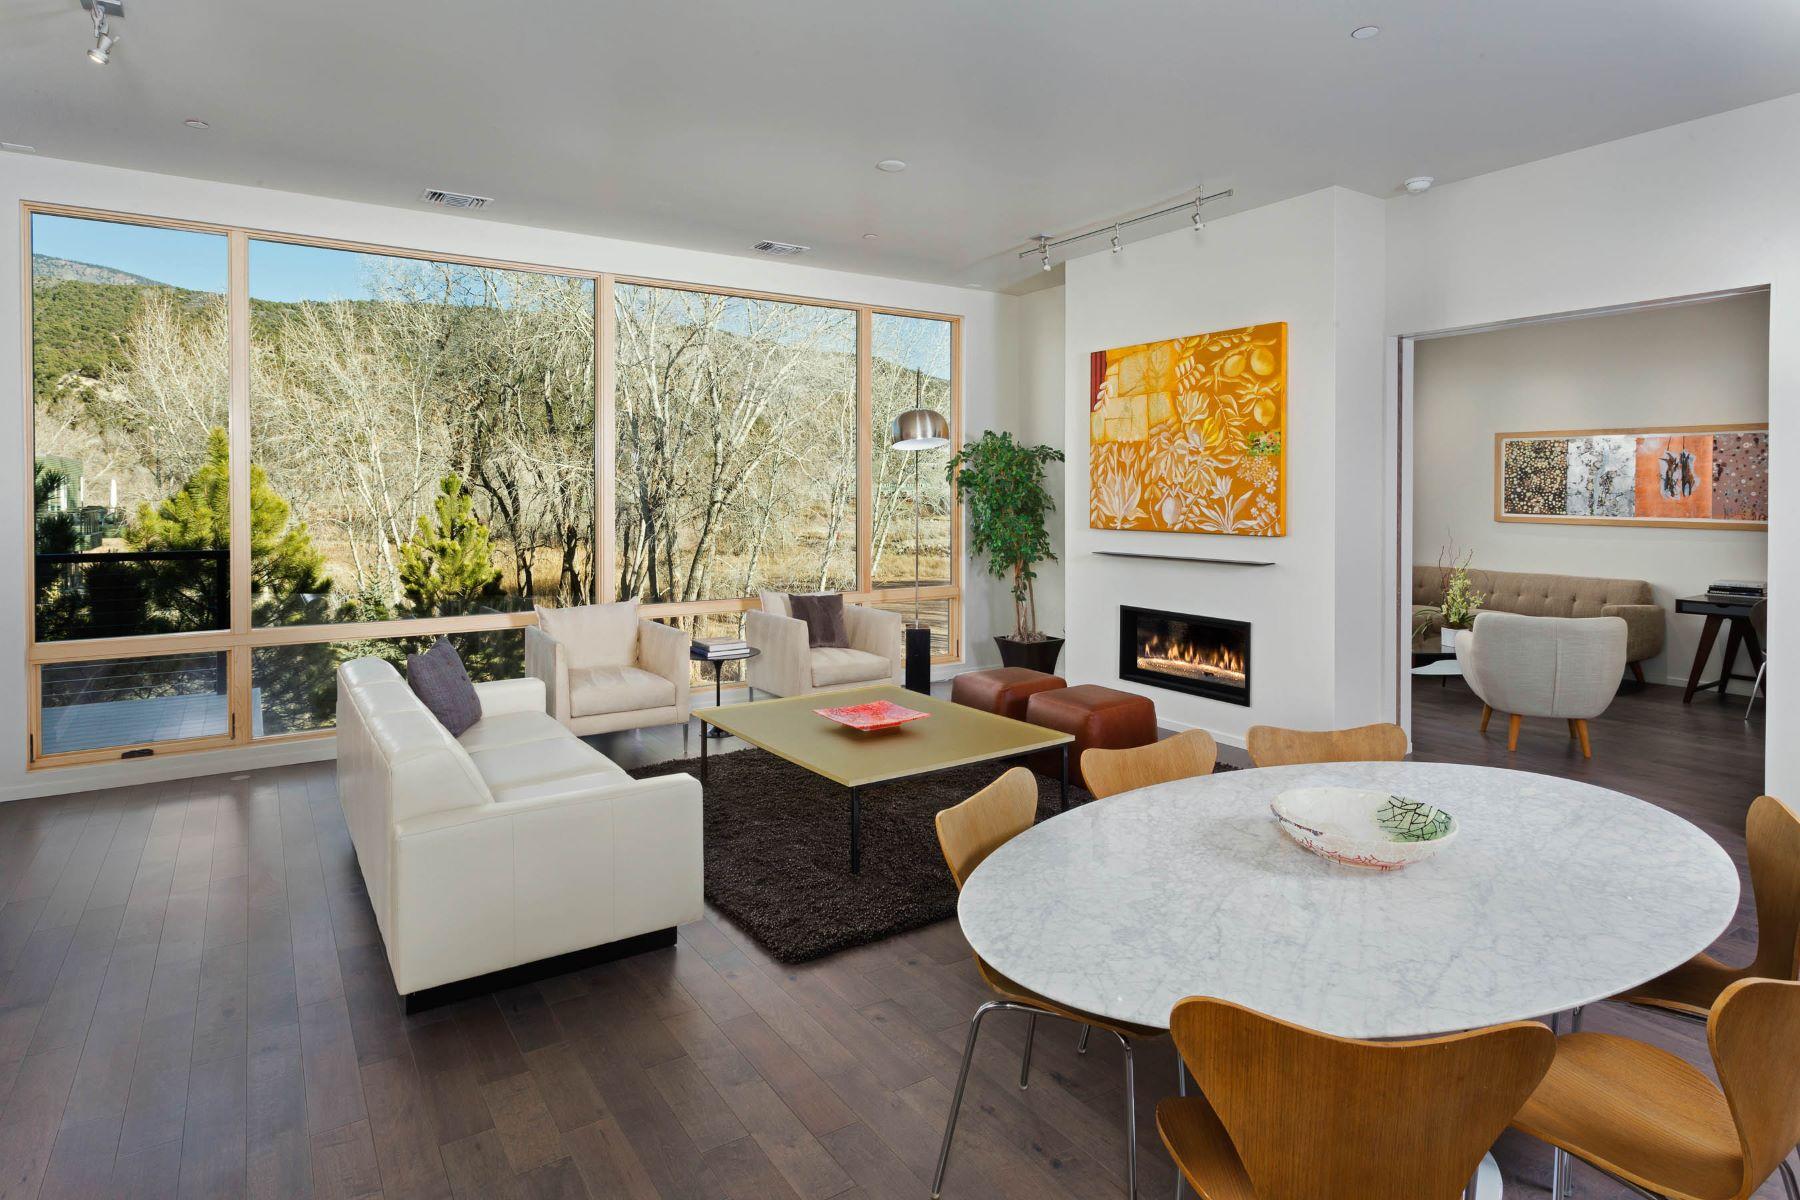 Condominium for Sale at Park Modern in Willits 102 Evans Road, Unit 105, Basalt, Colorado, 81621 United States